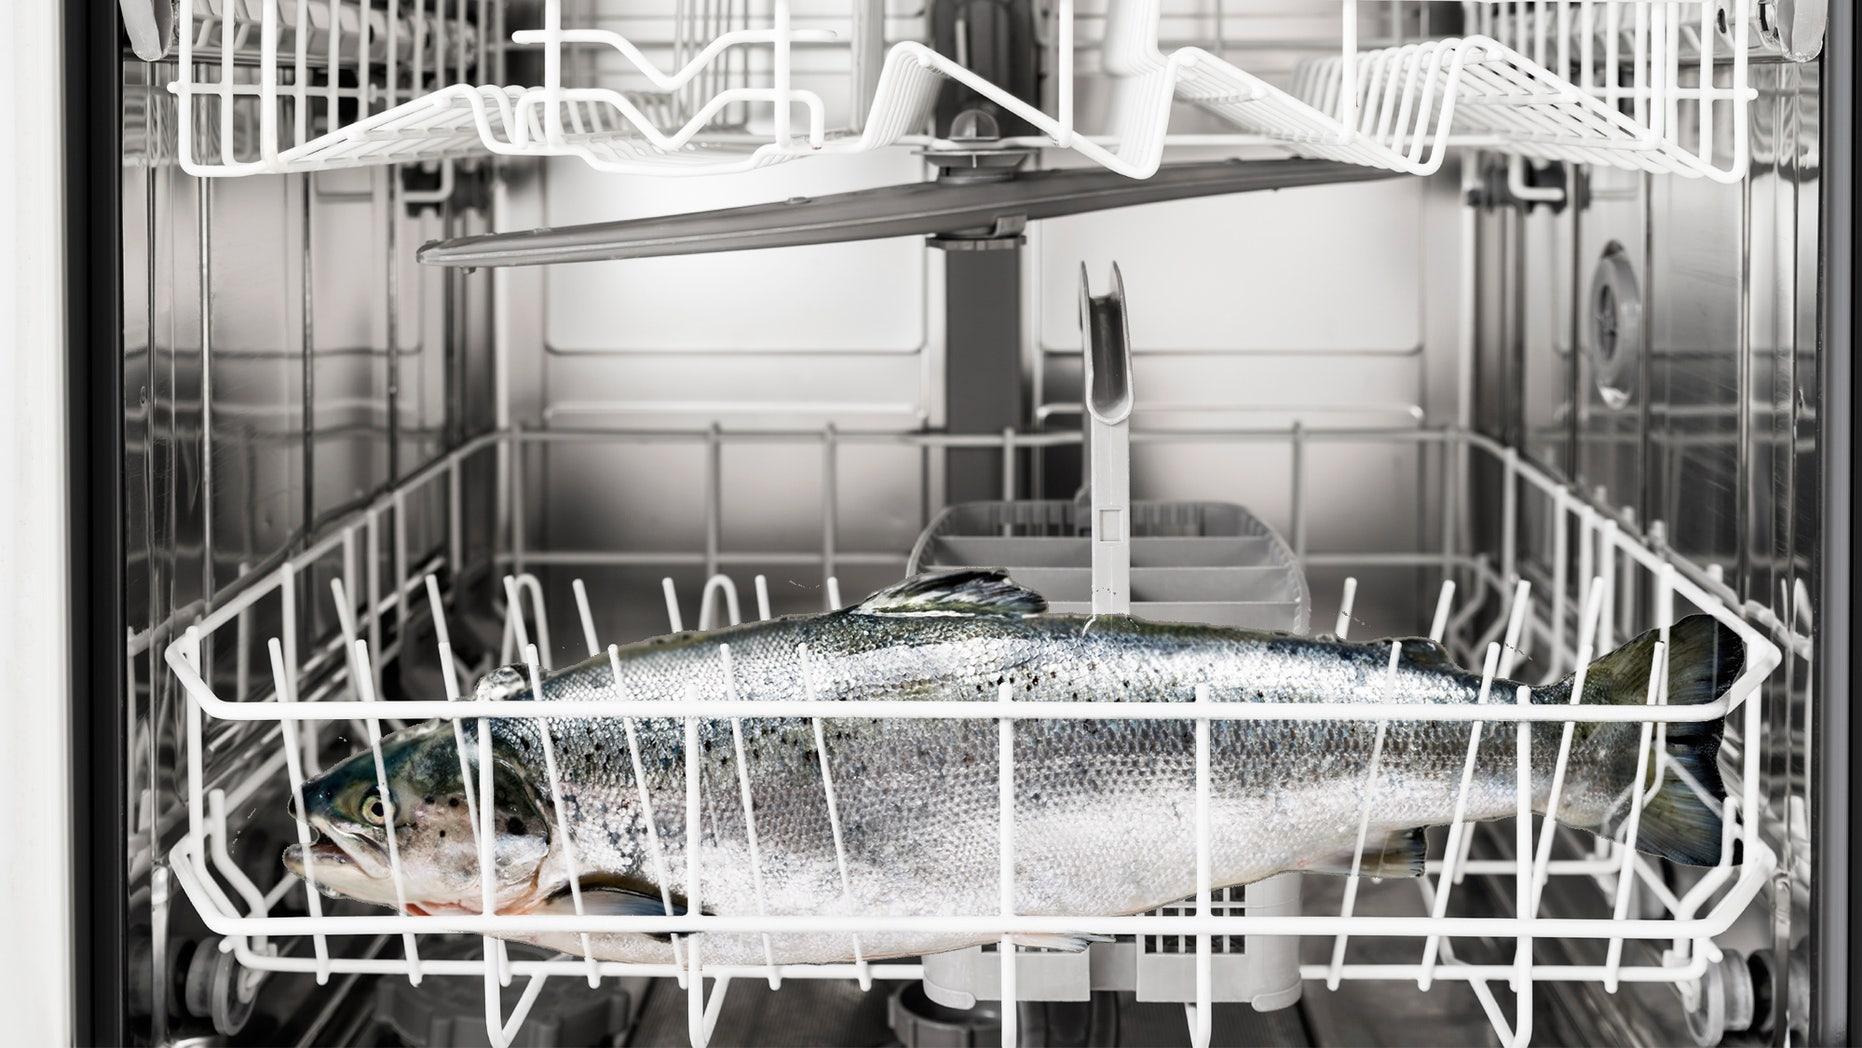 salmon in dishwasher